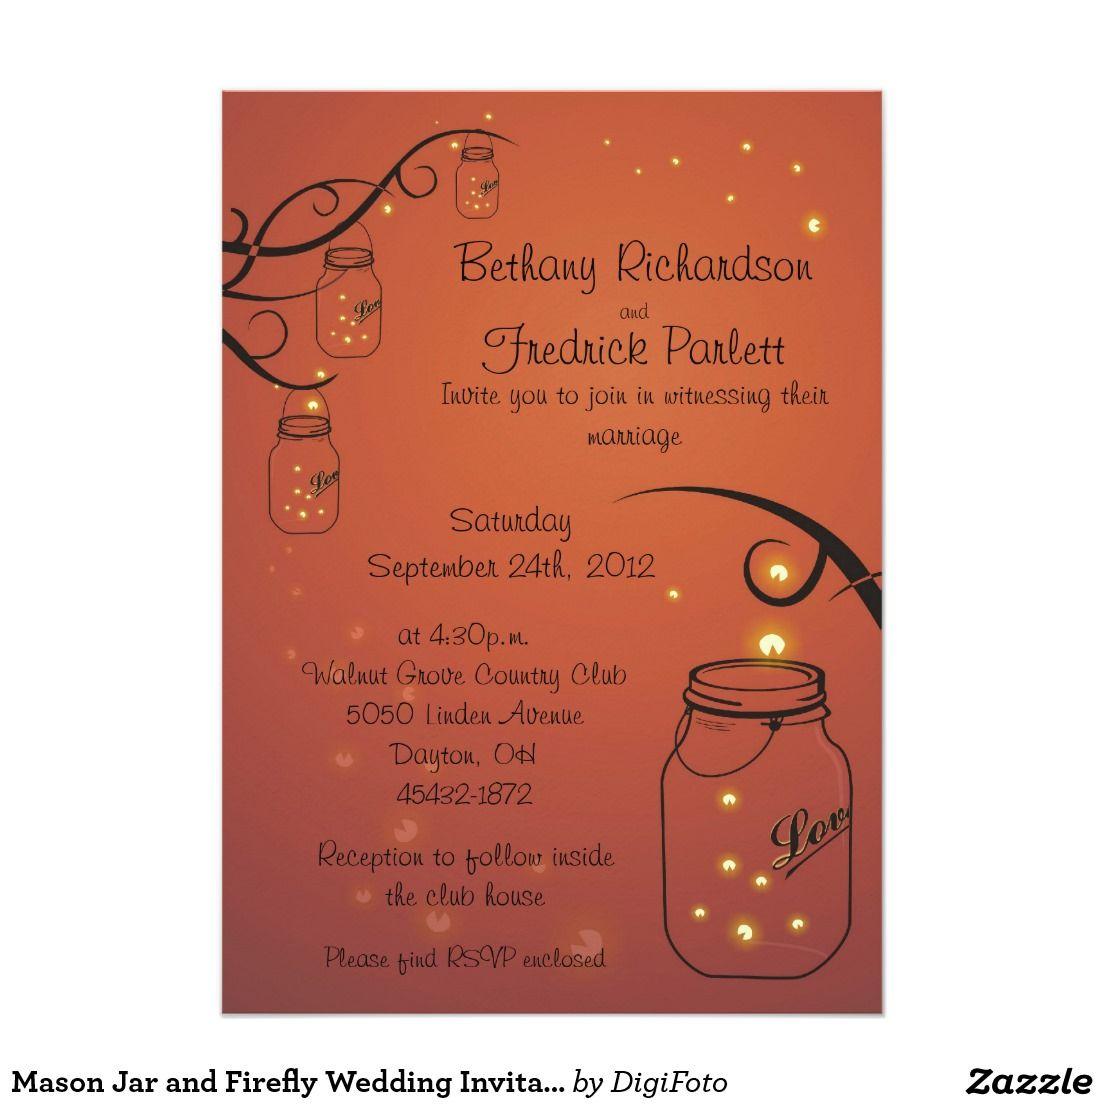 Mason Jar and Firefly Wedding Invitation Orange | Pinterest | Weddings